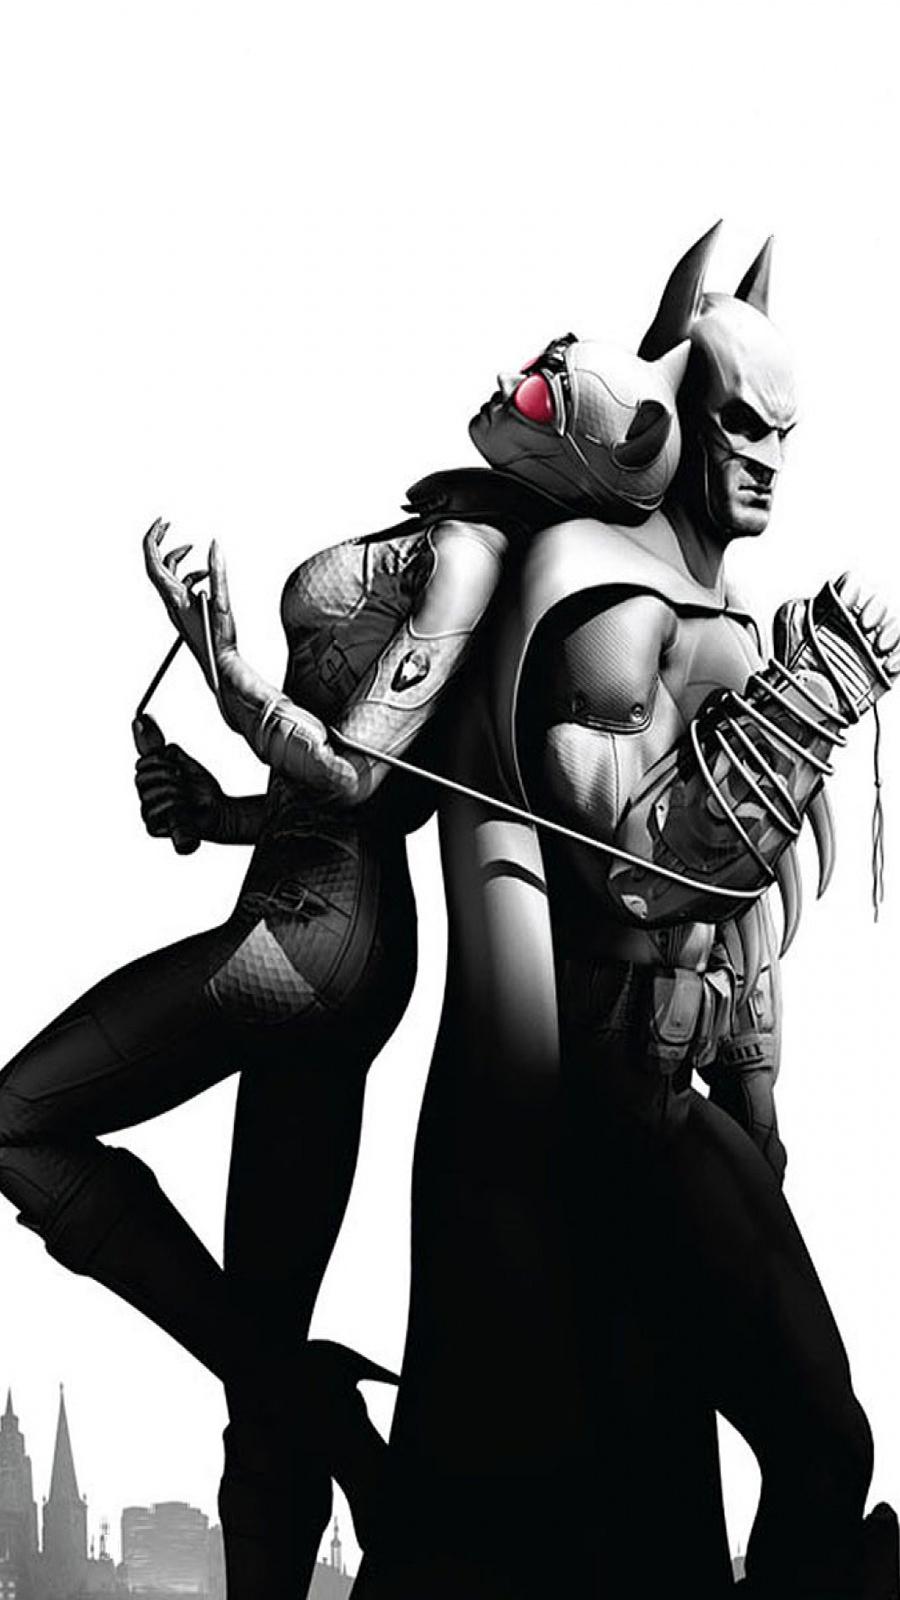 Batman & Catwoman Wallpapers Free Download